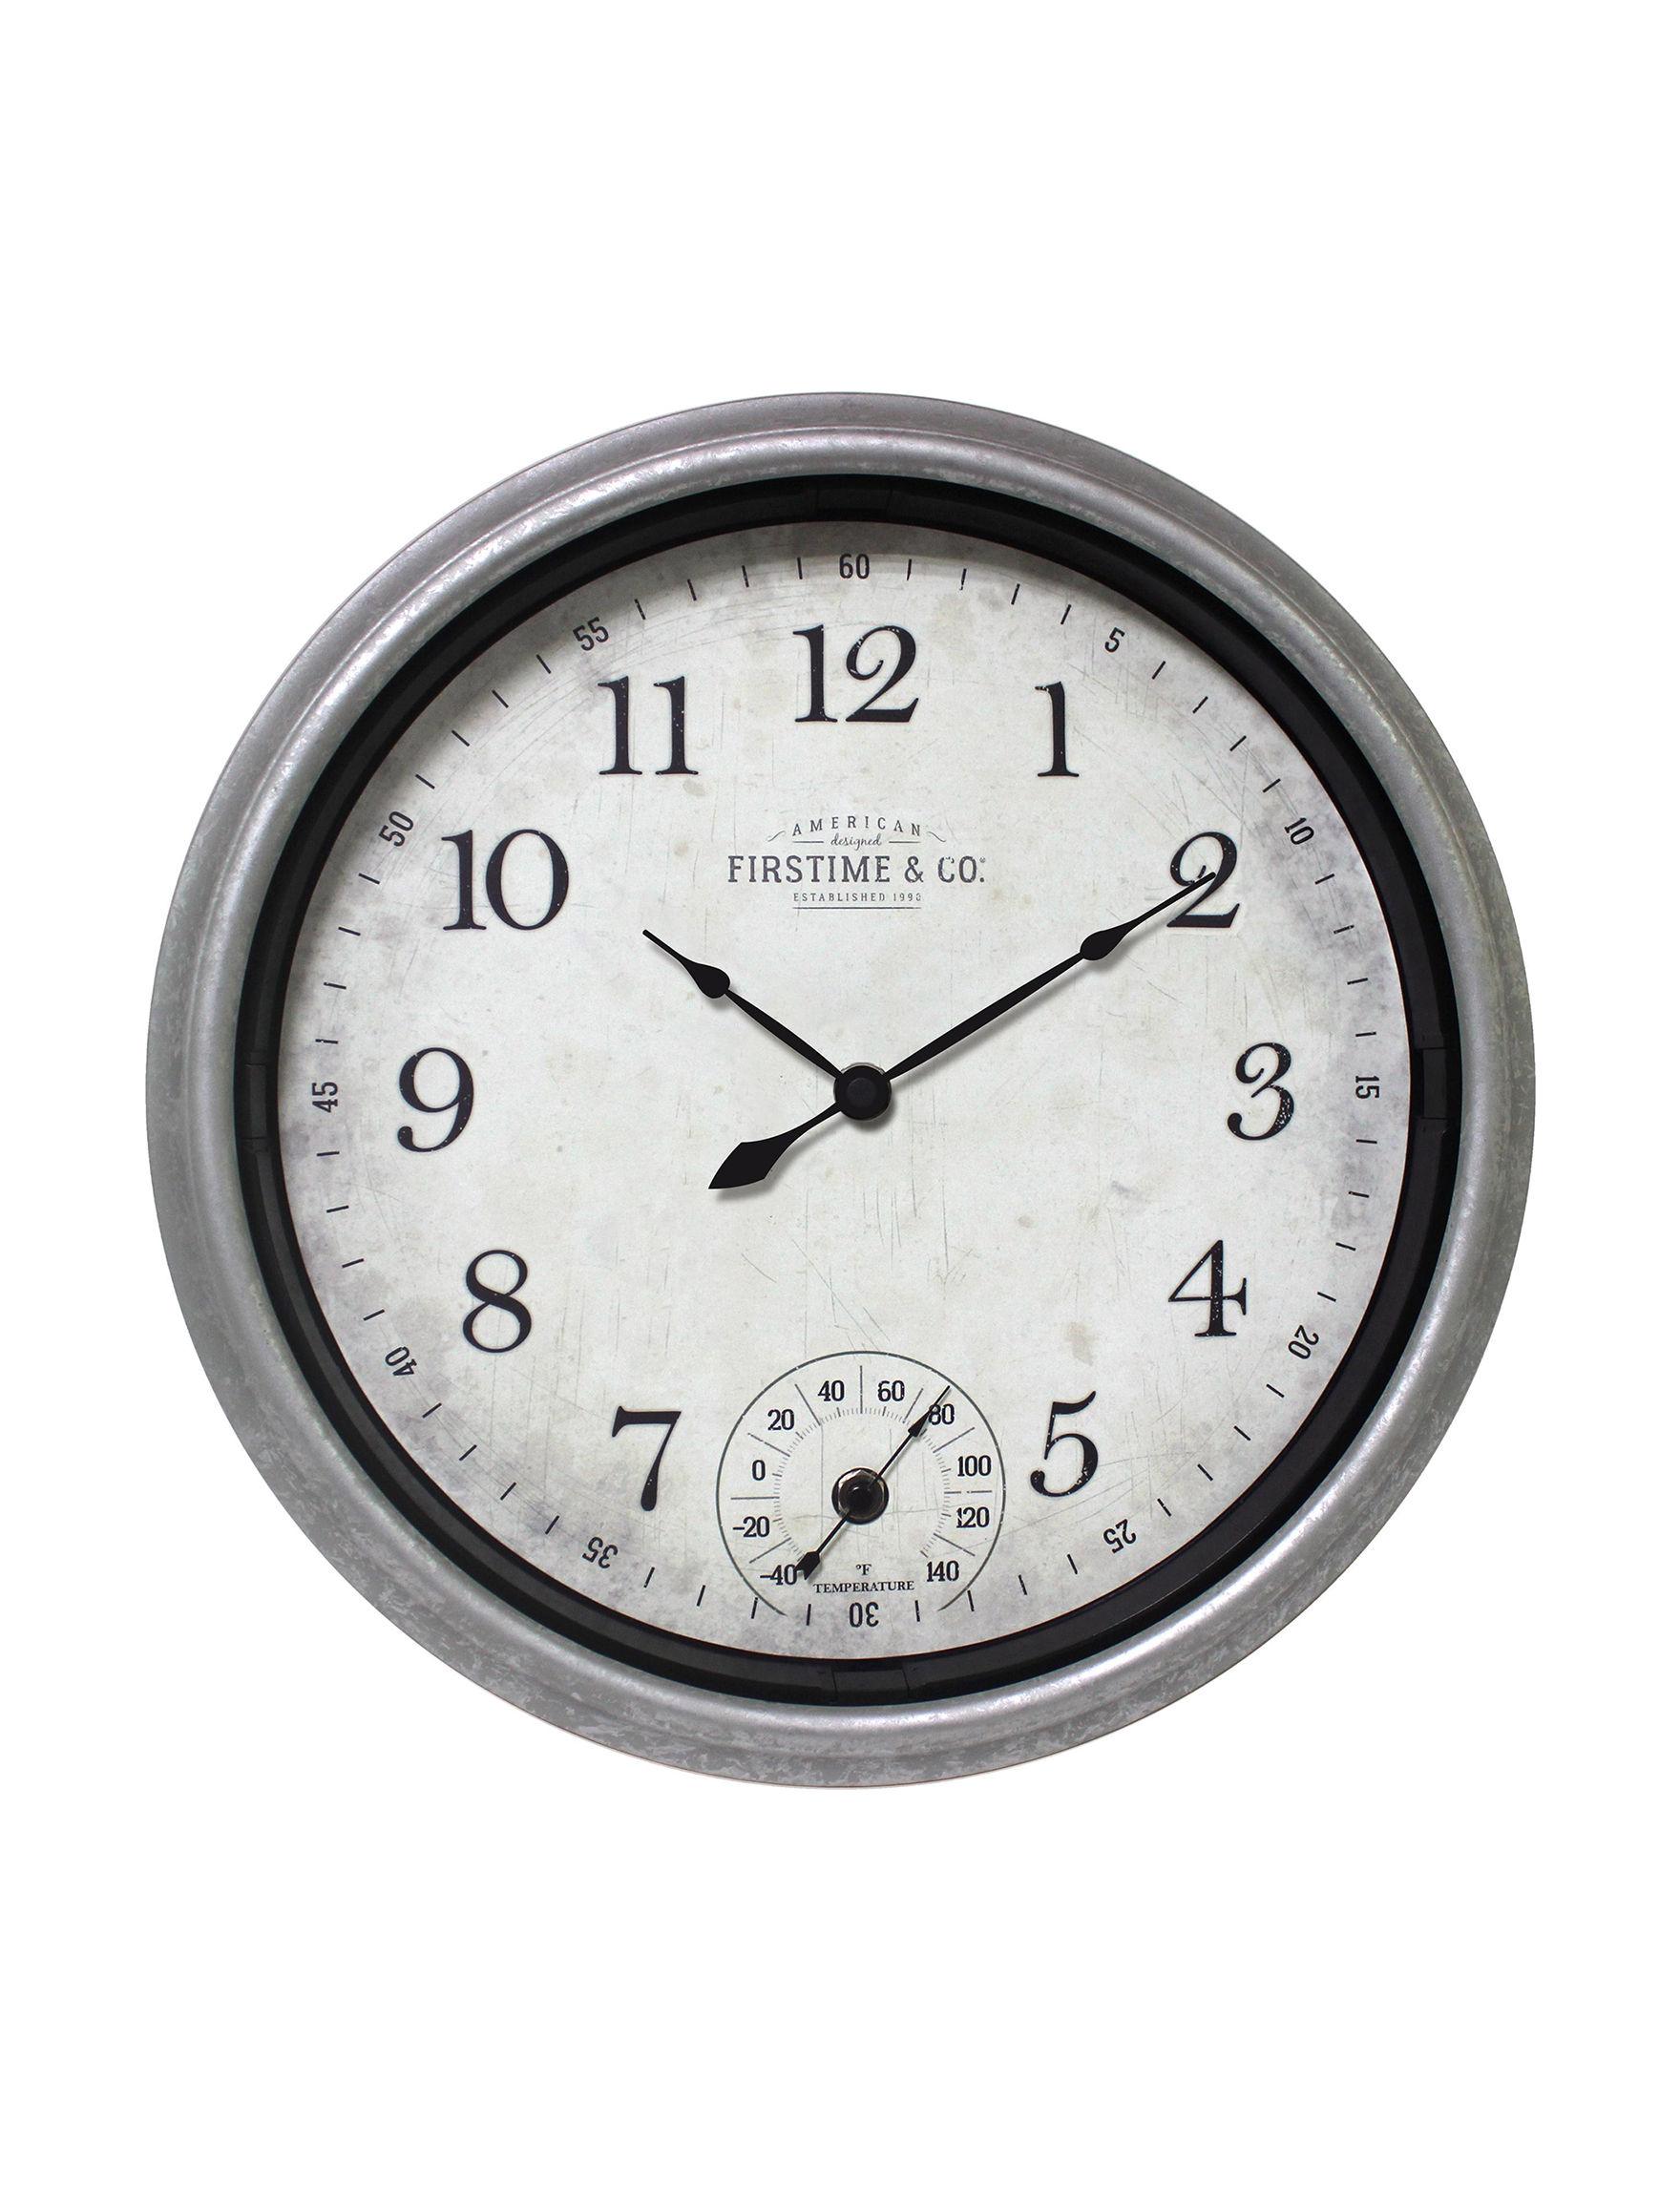 Firstime Manufactory  Wall Clocks Wall Decor